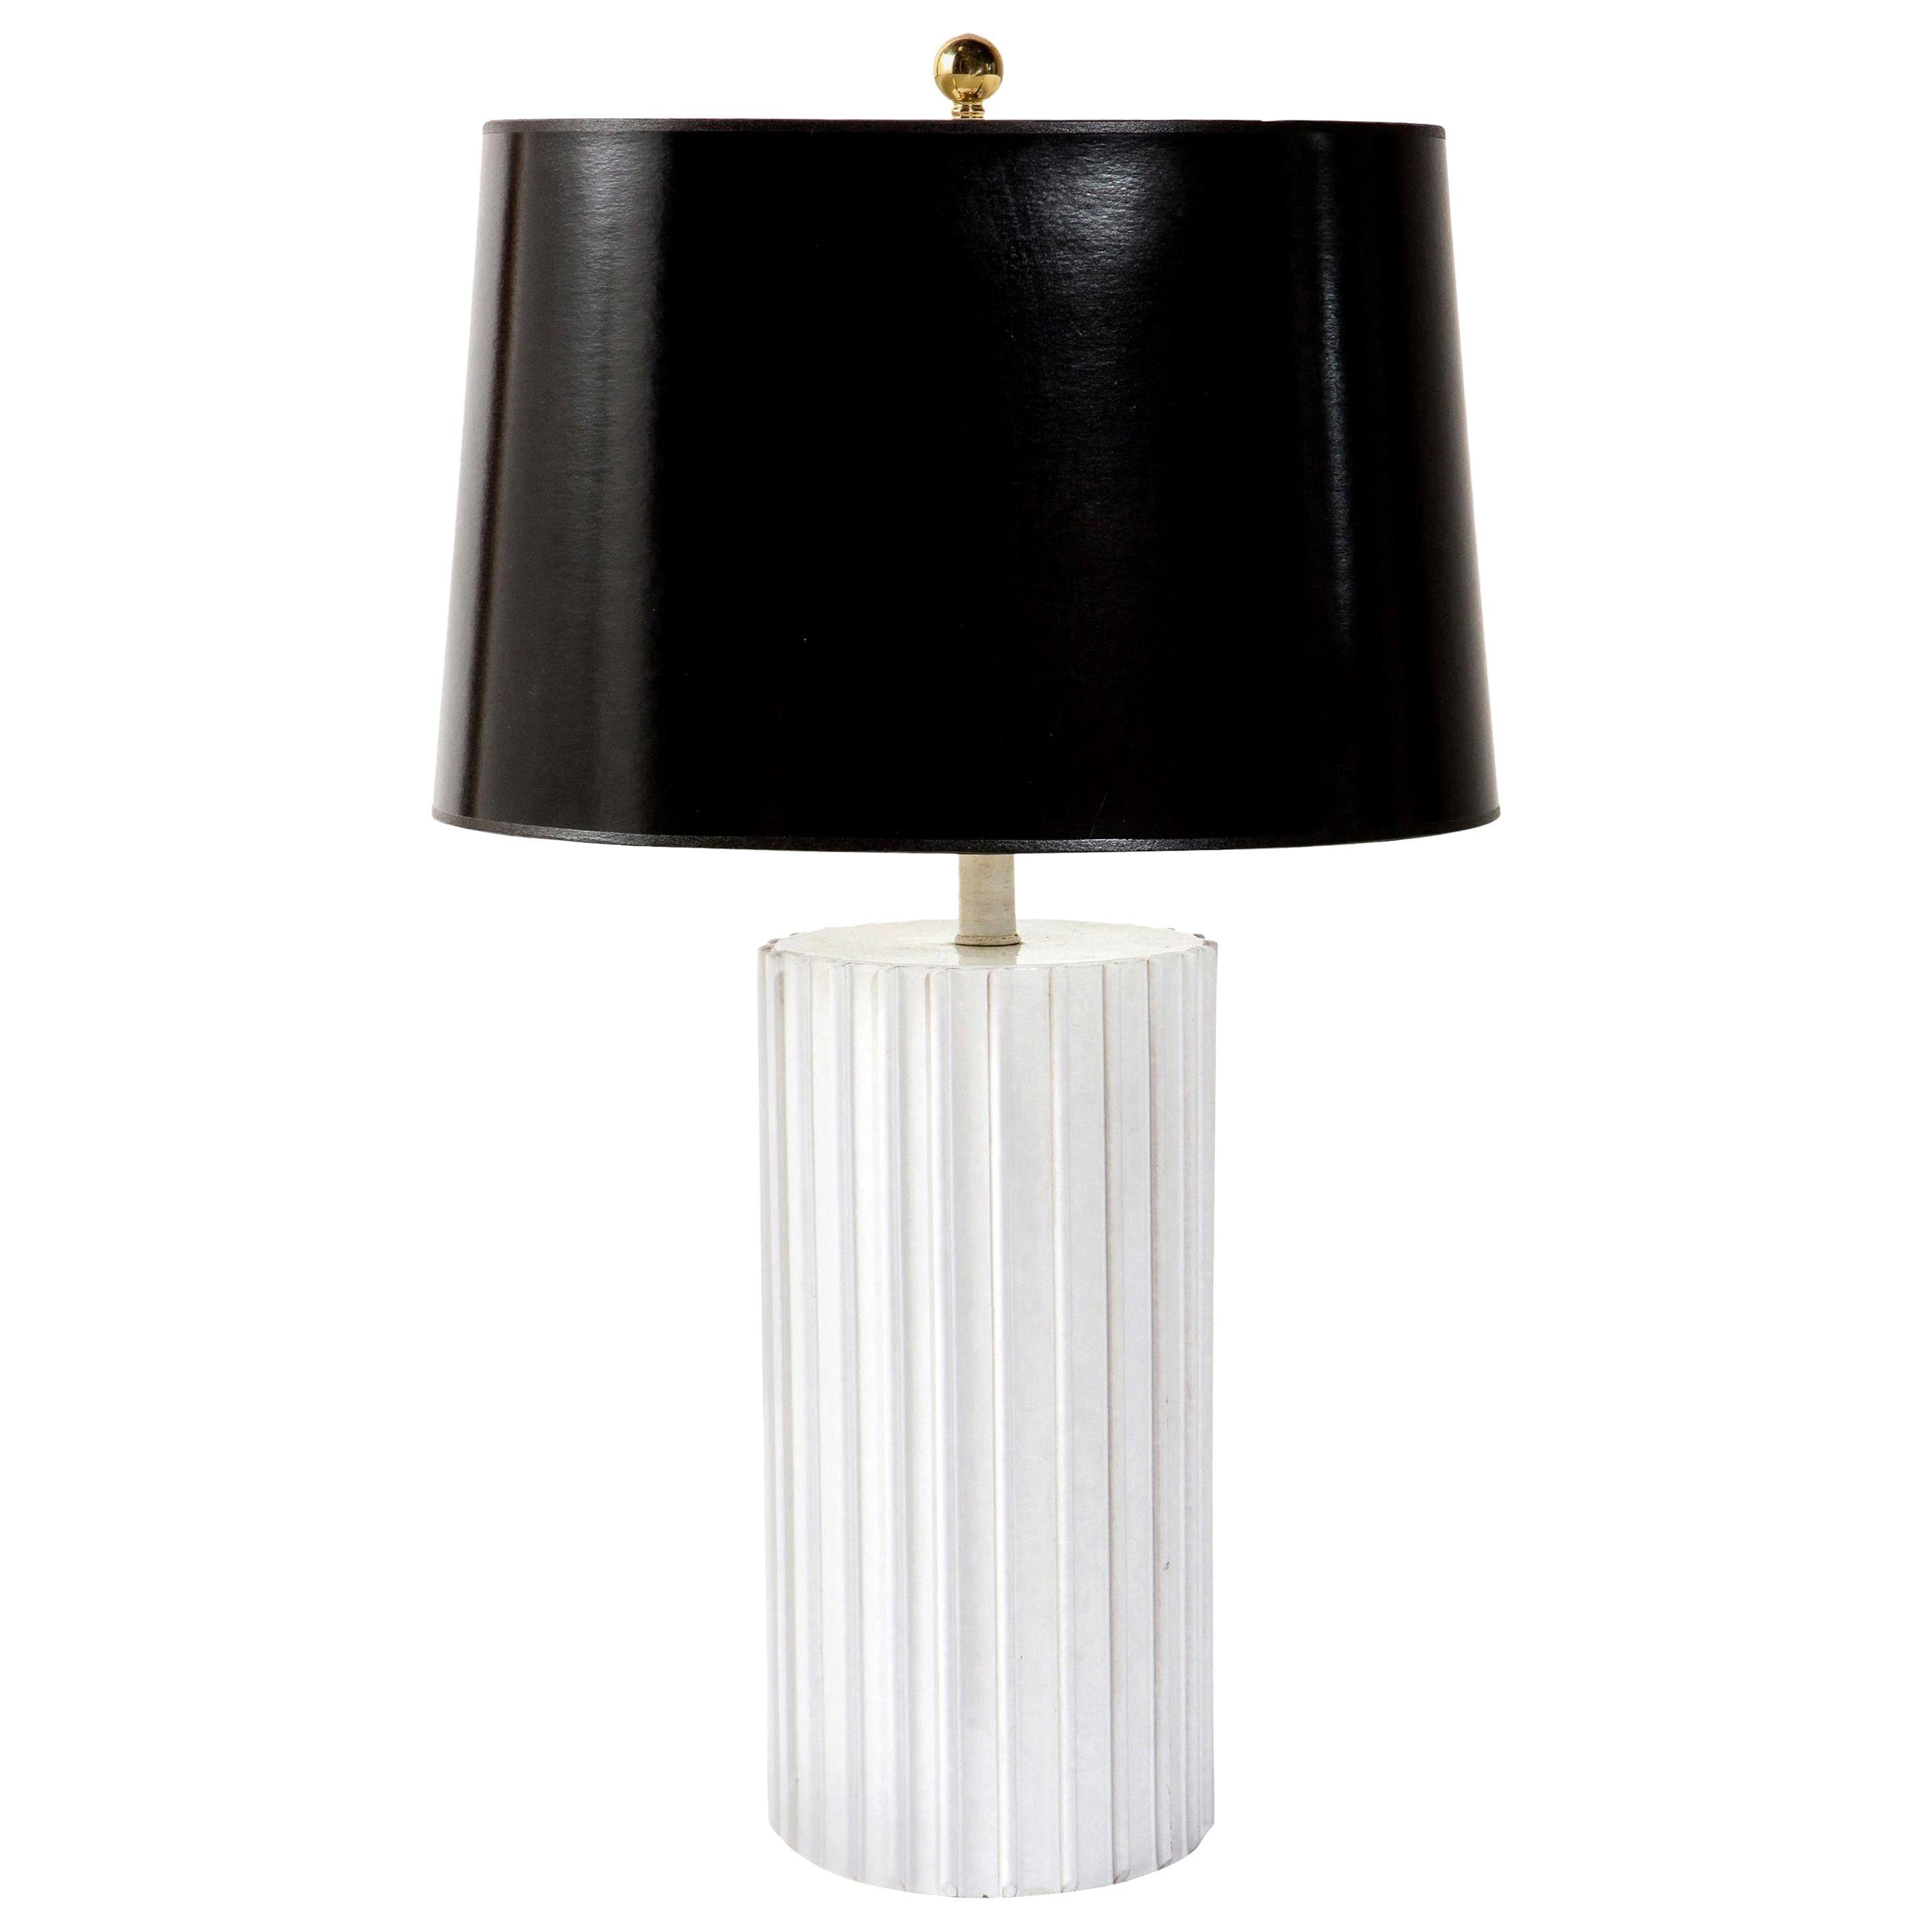 Table Lamp, Ceramic, White, Midcentury, circa 1960, Vintage, Good Condition